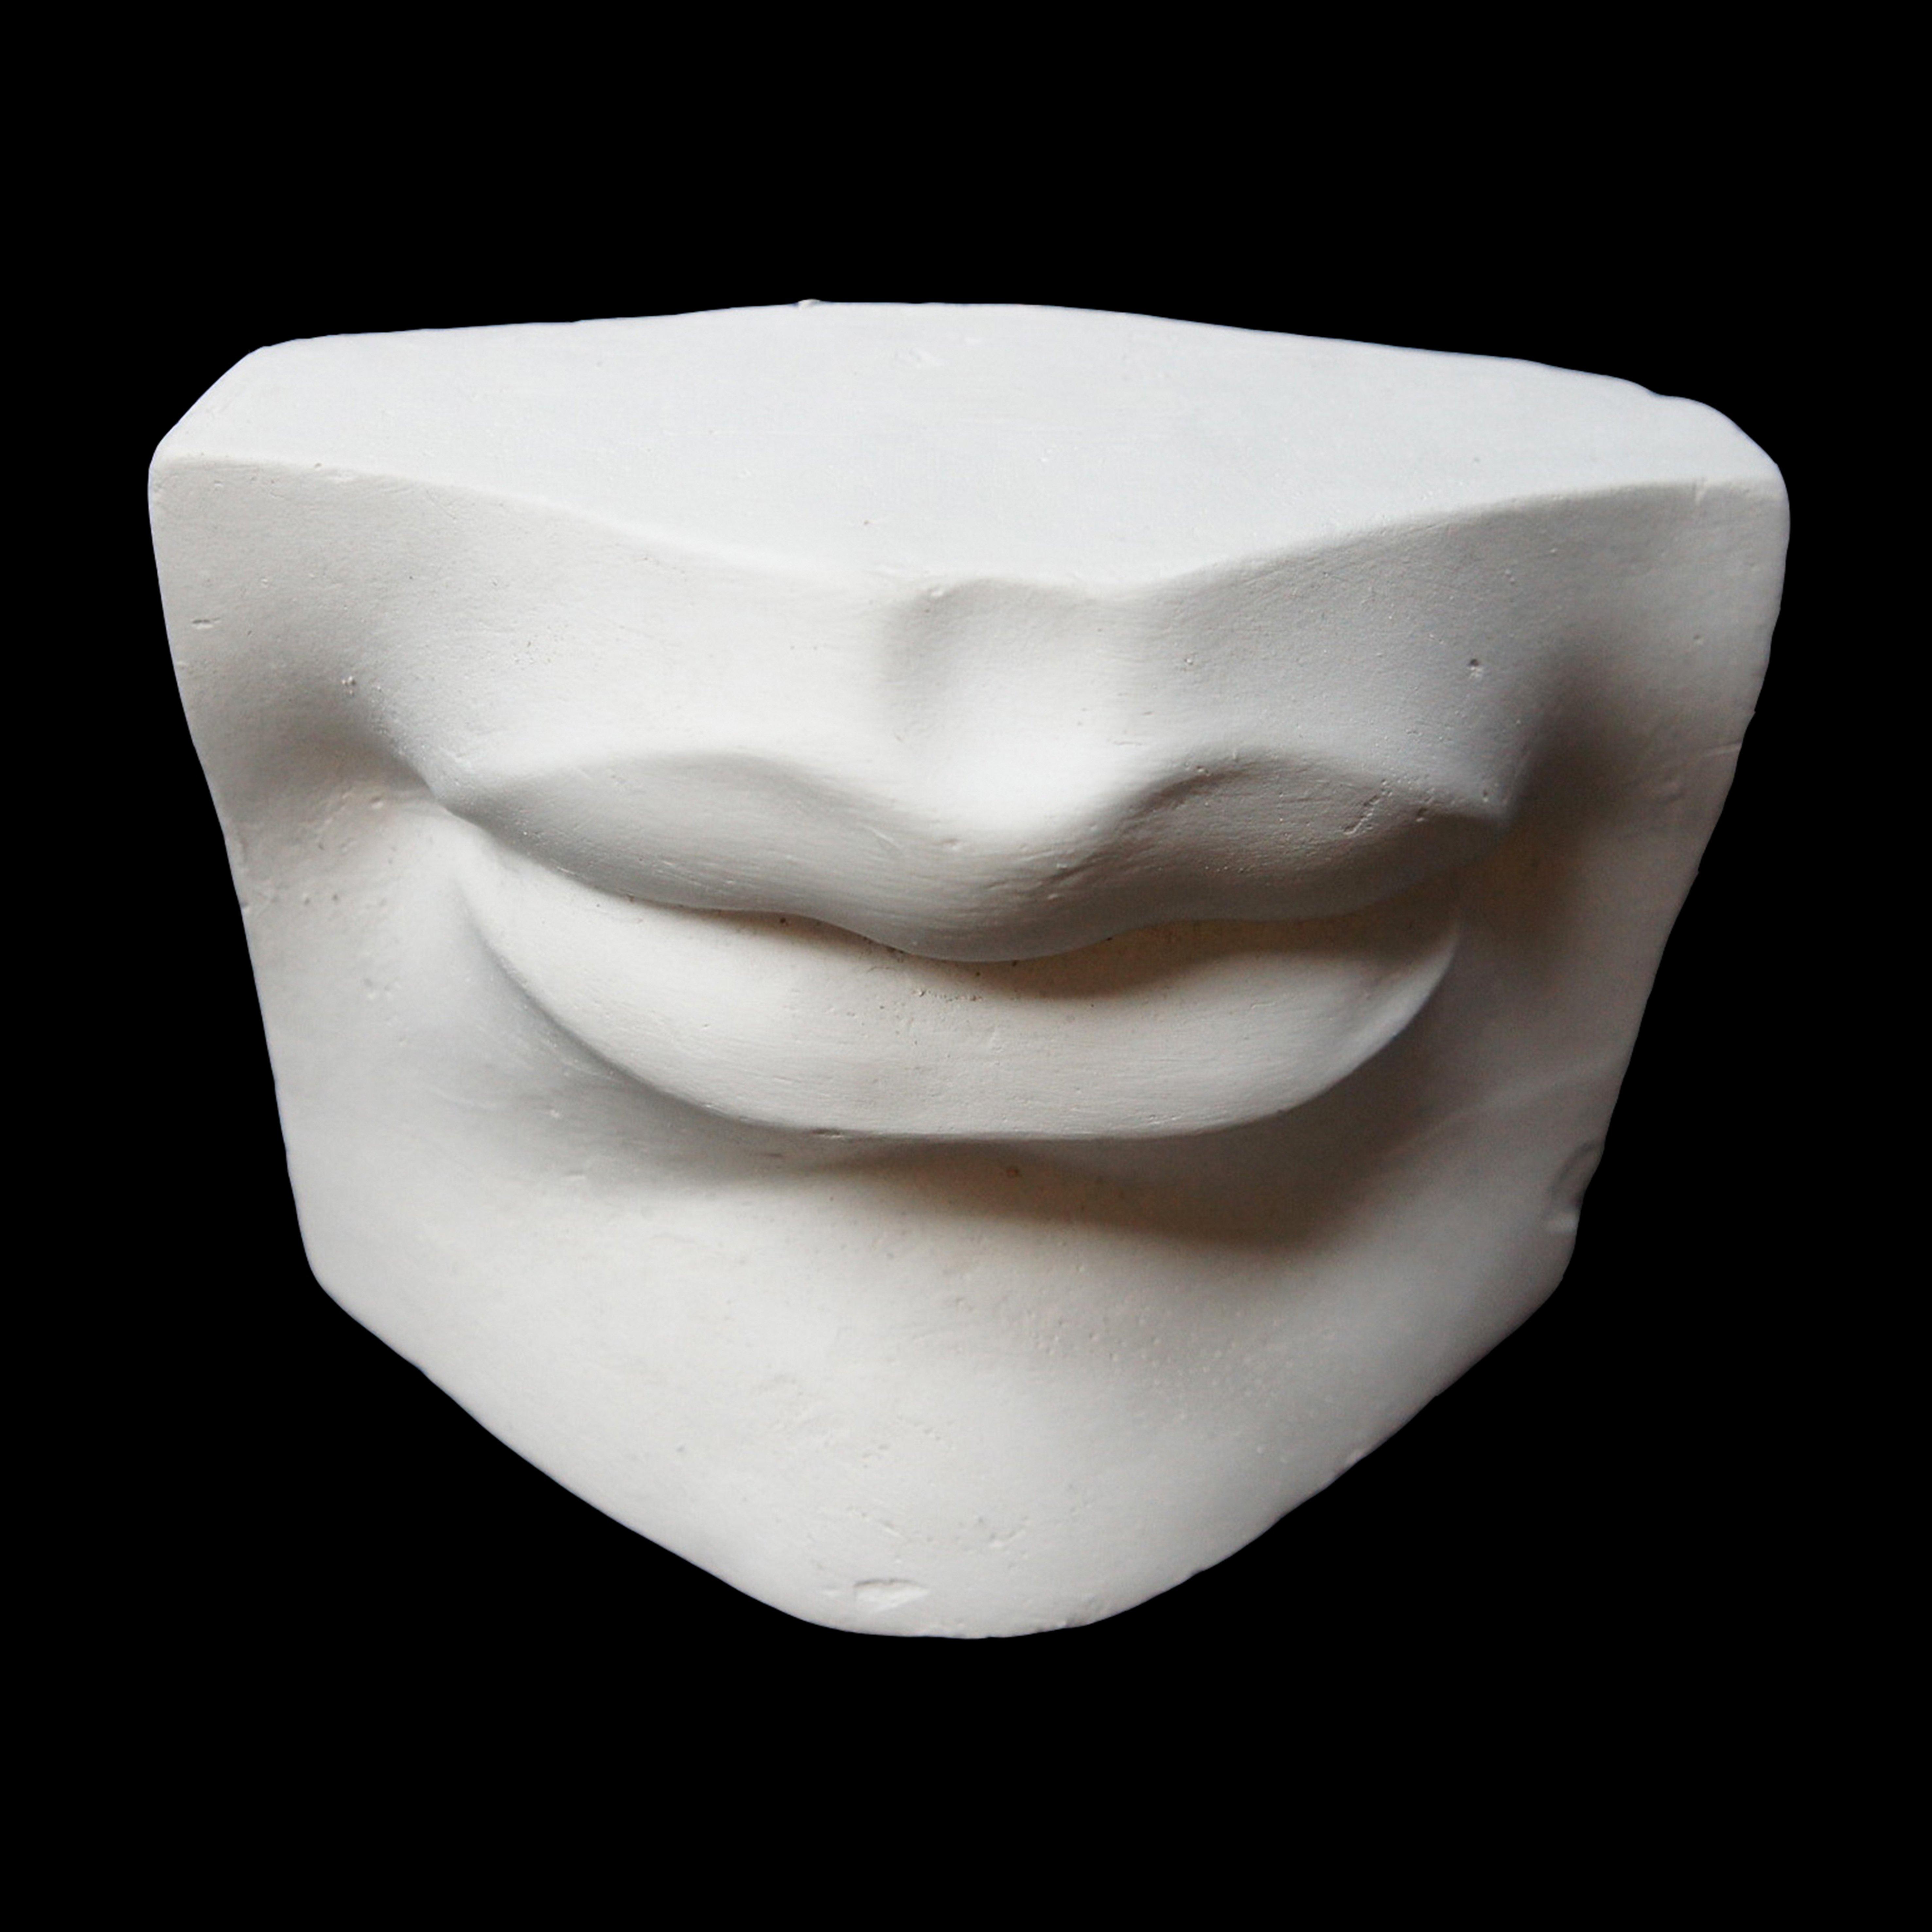 Plaster Casts David S Lips London Art Shop Buy Art